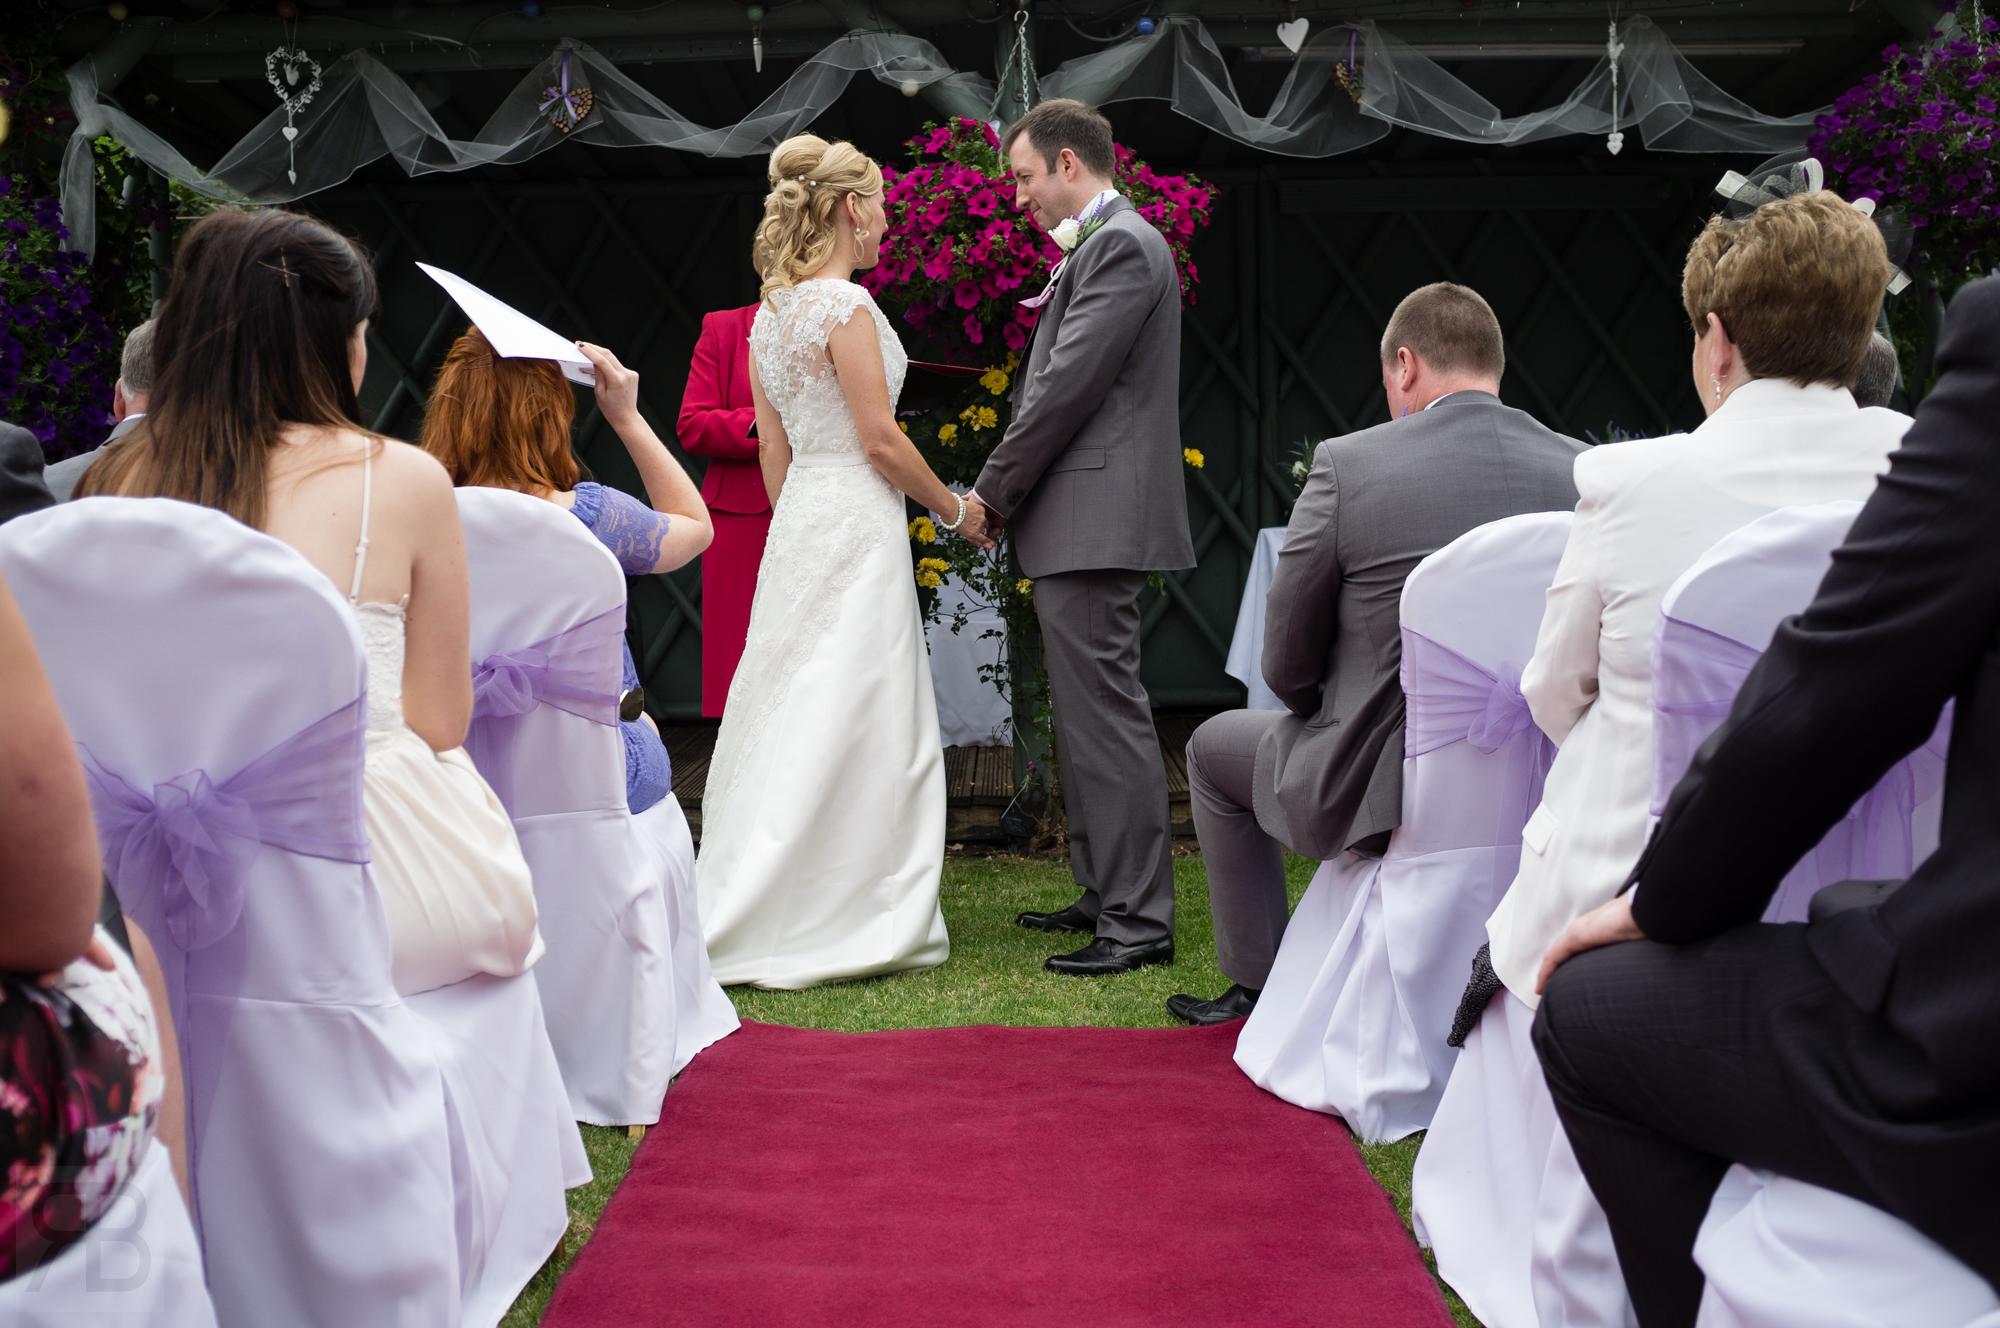 110715_LisaCraigJohnson_Wedding_1593670_WebWM.jpg